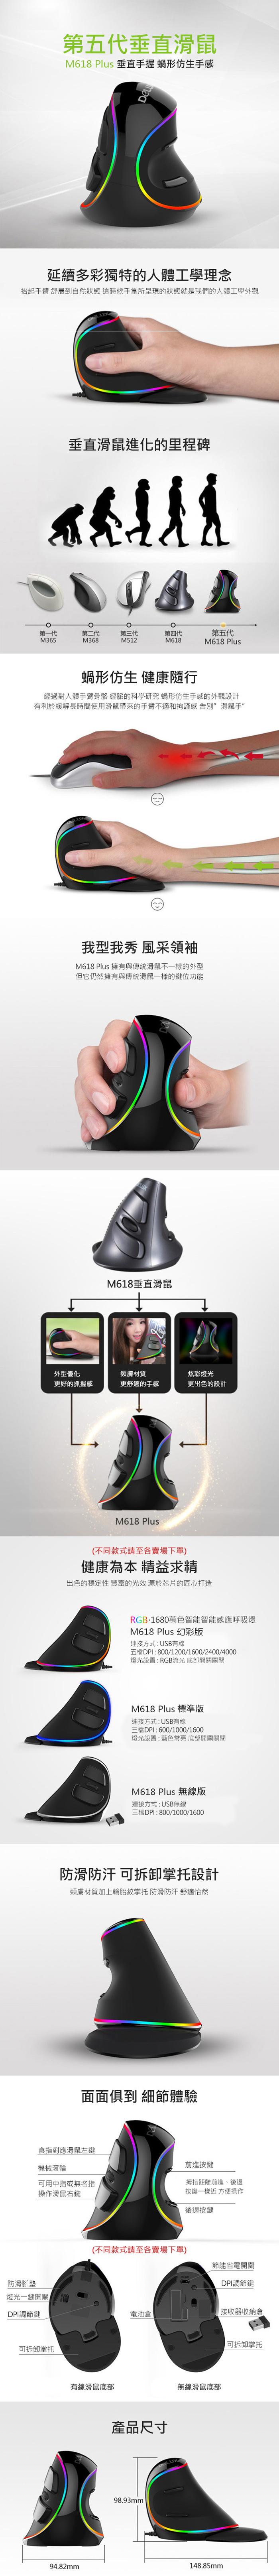 (複製)DeLUX|M618C 垂直光學滑鼠